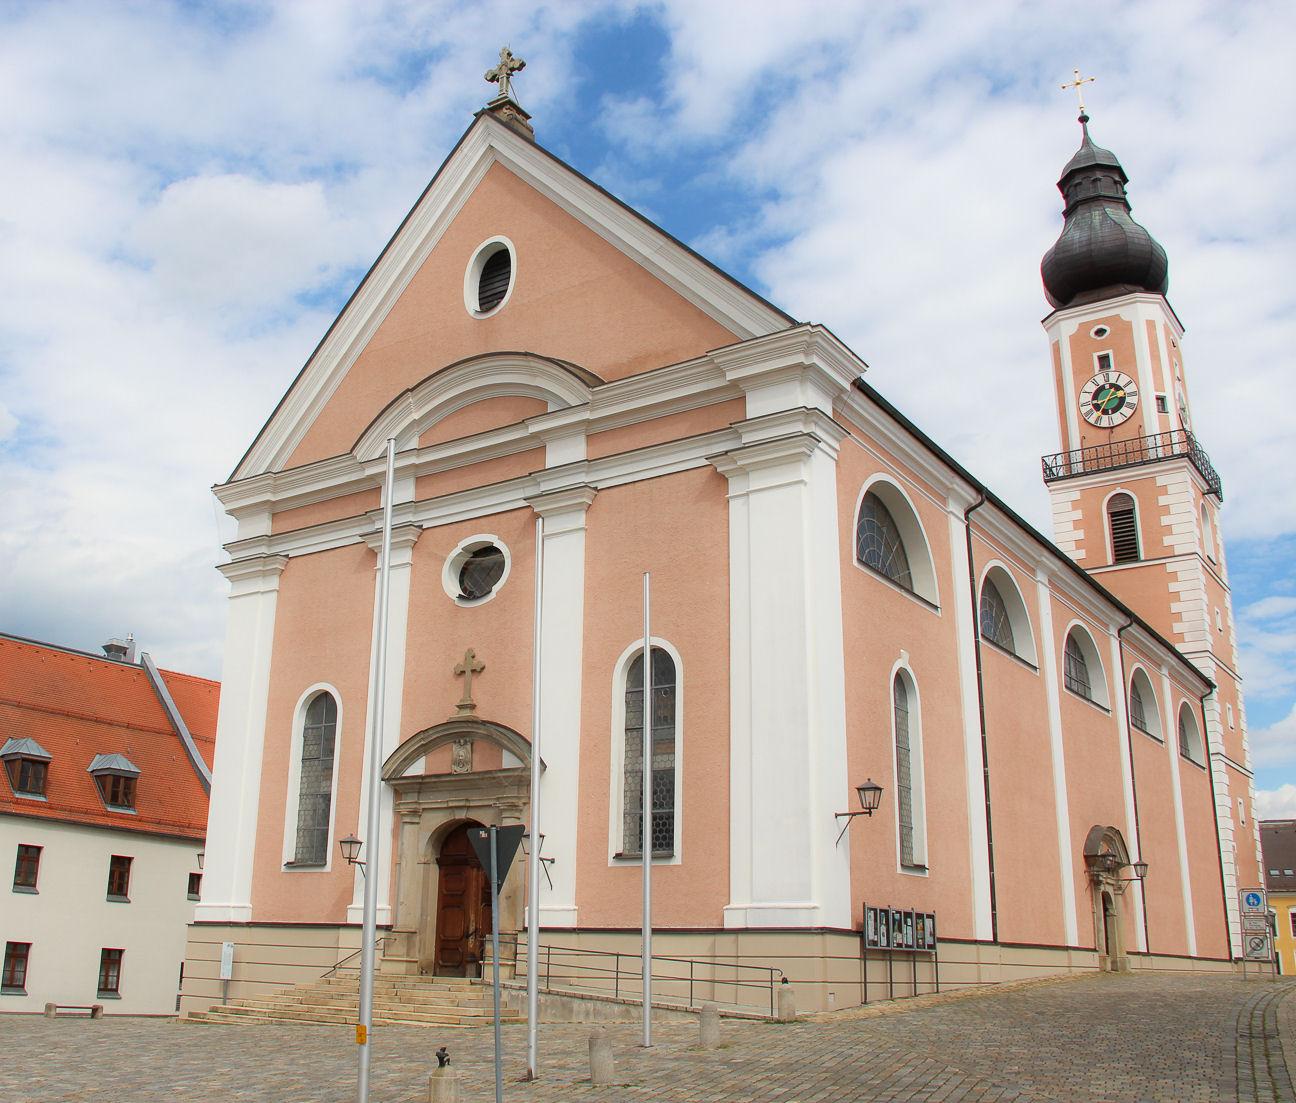 St Josef Cham